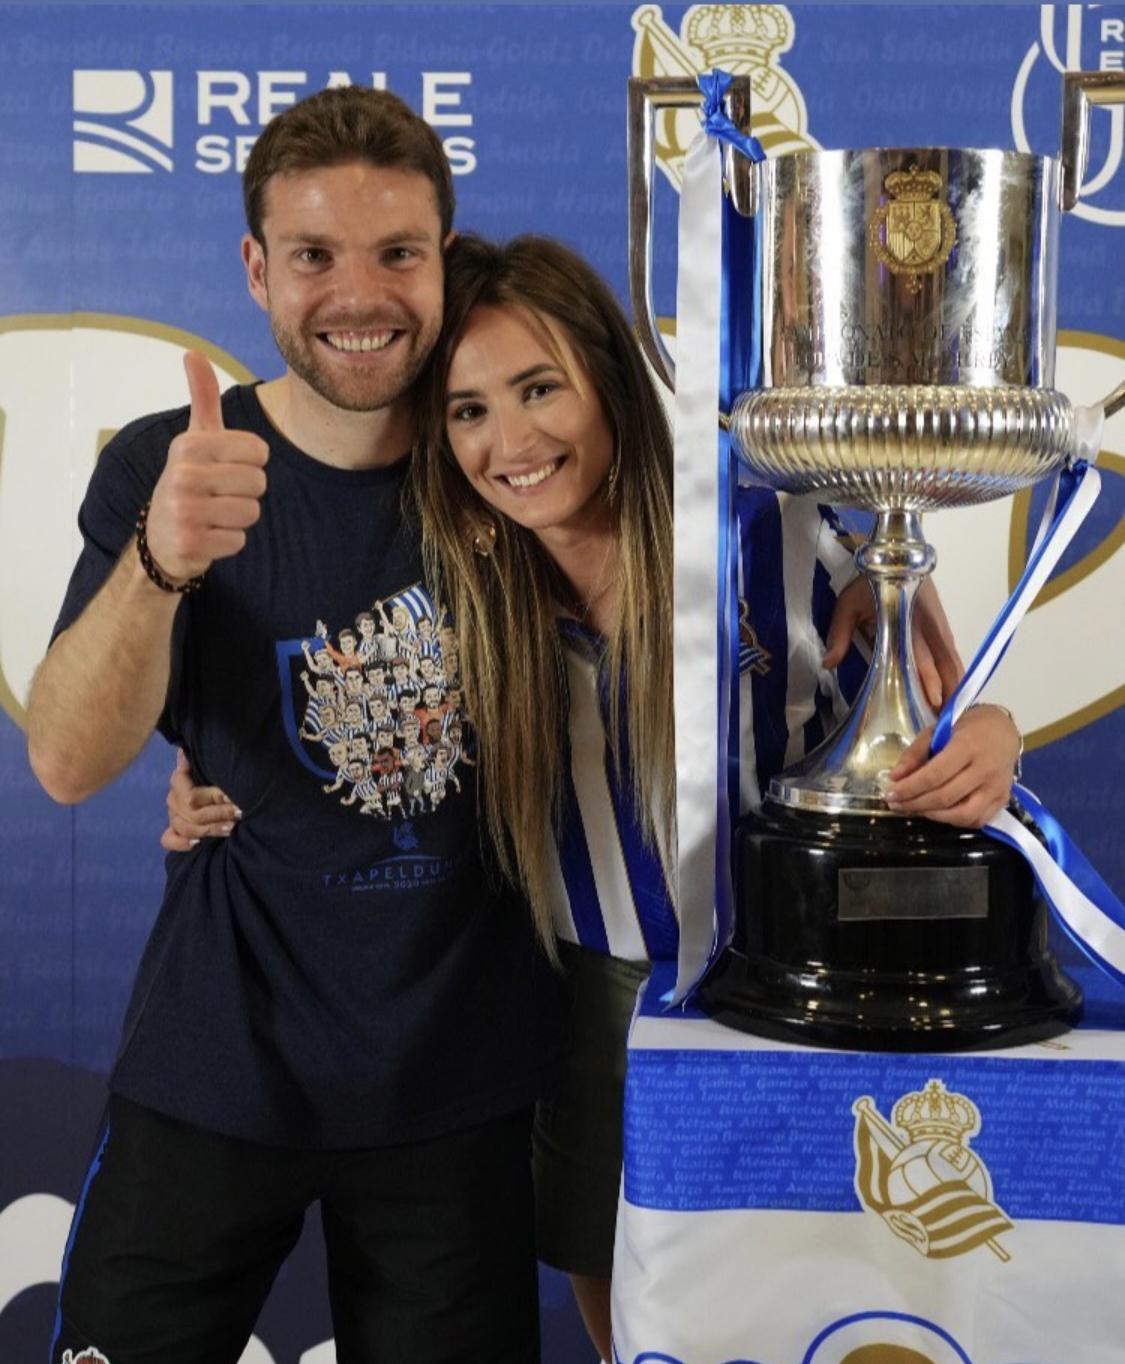 Final Copa del Rey 2020 (03-04-21) La Cartuja, Sevilla